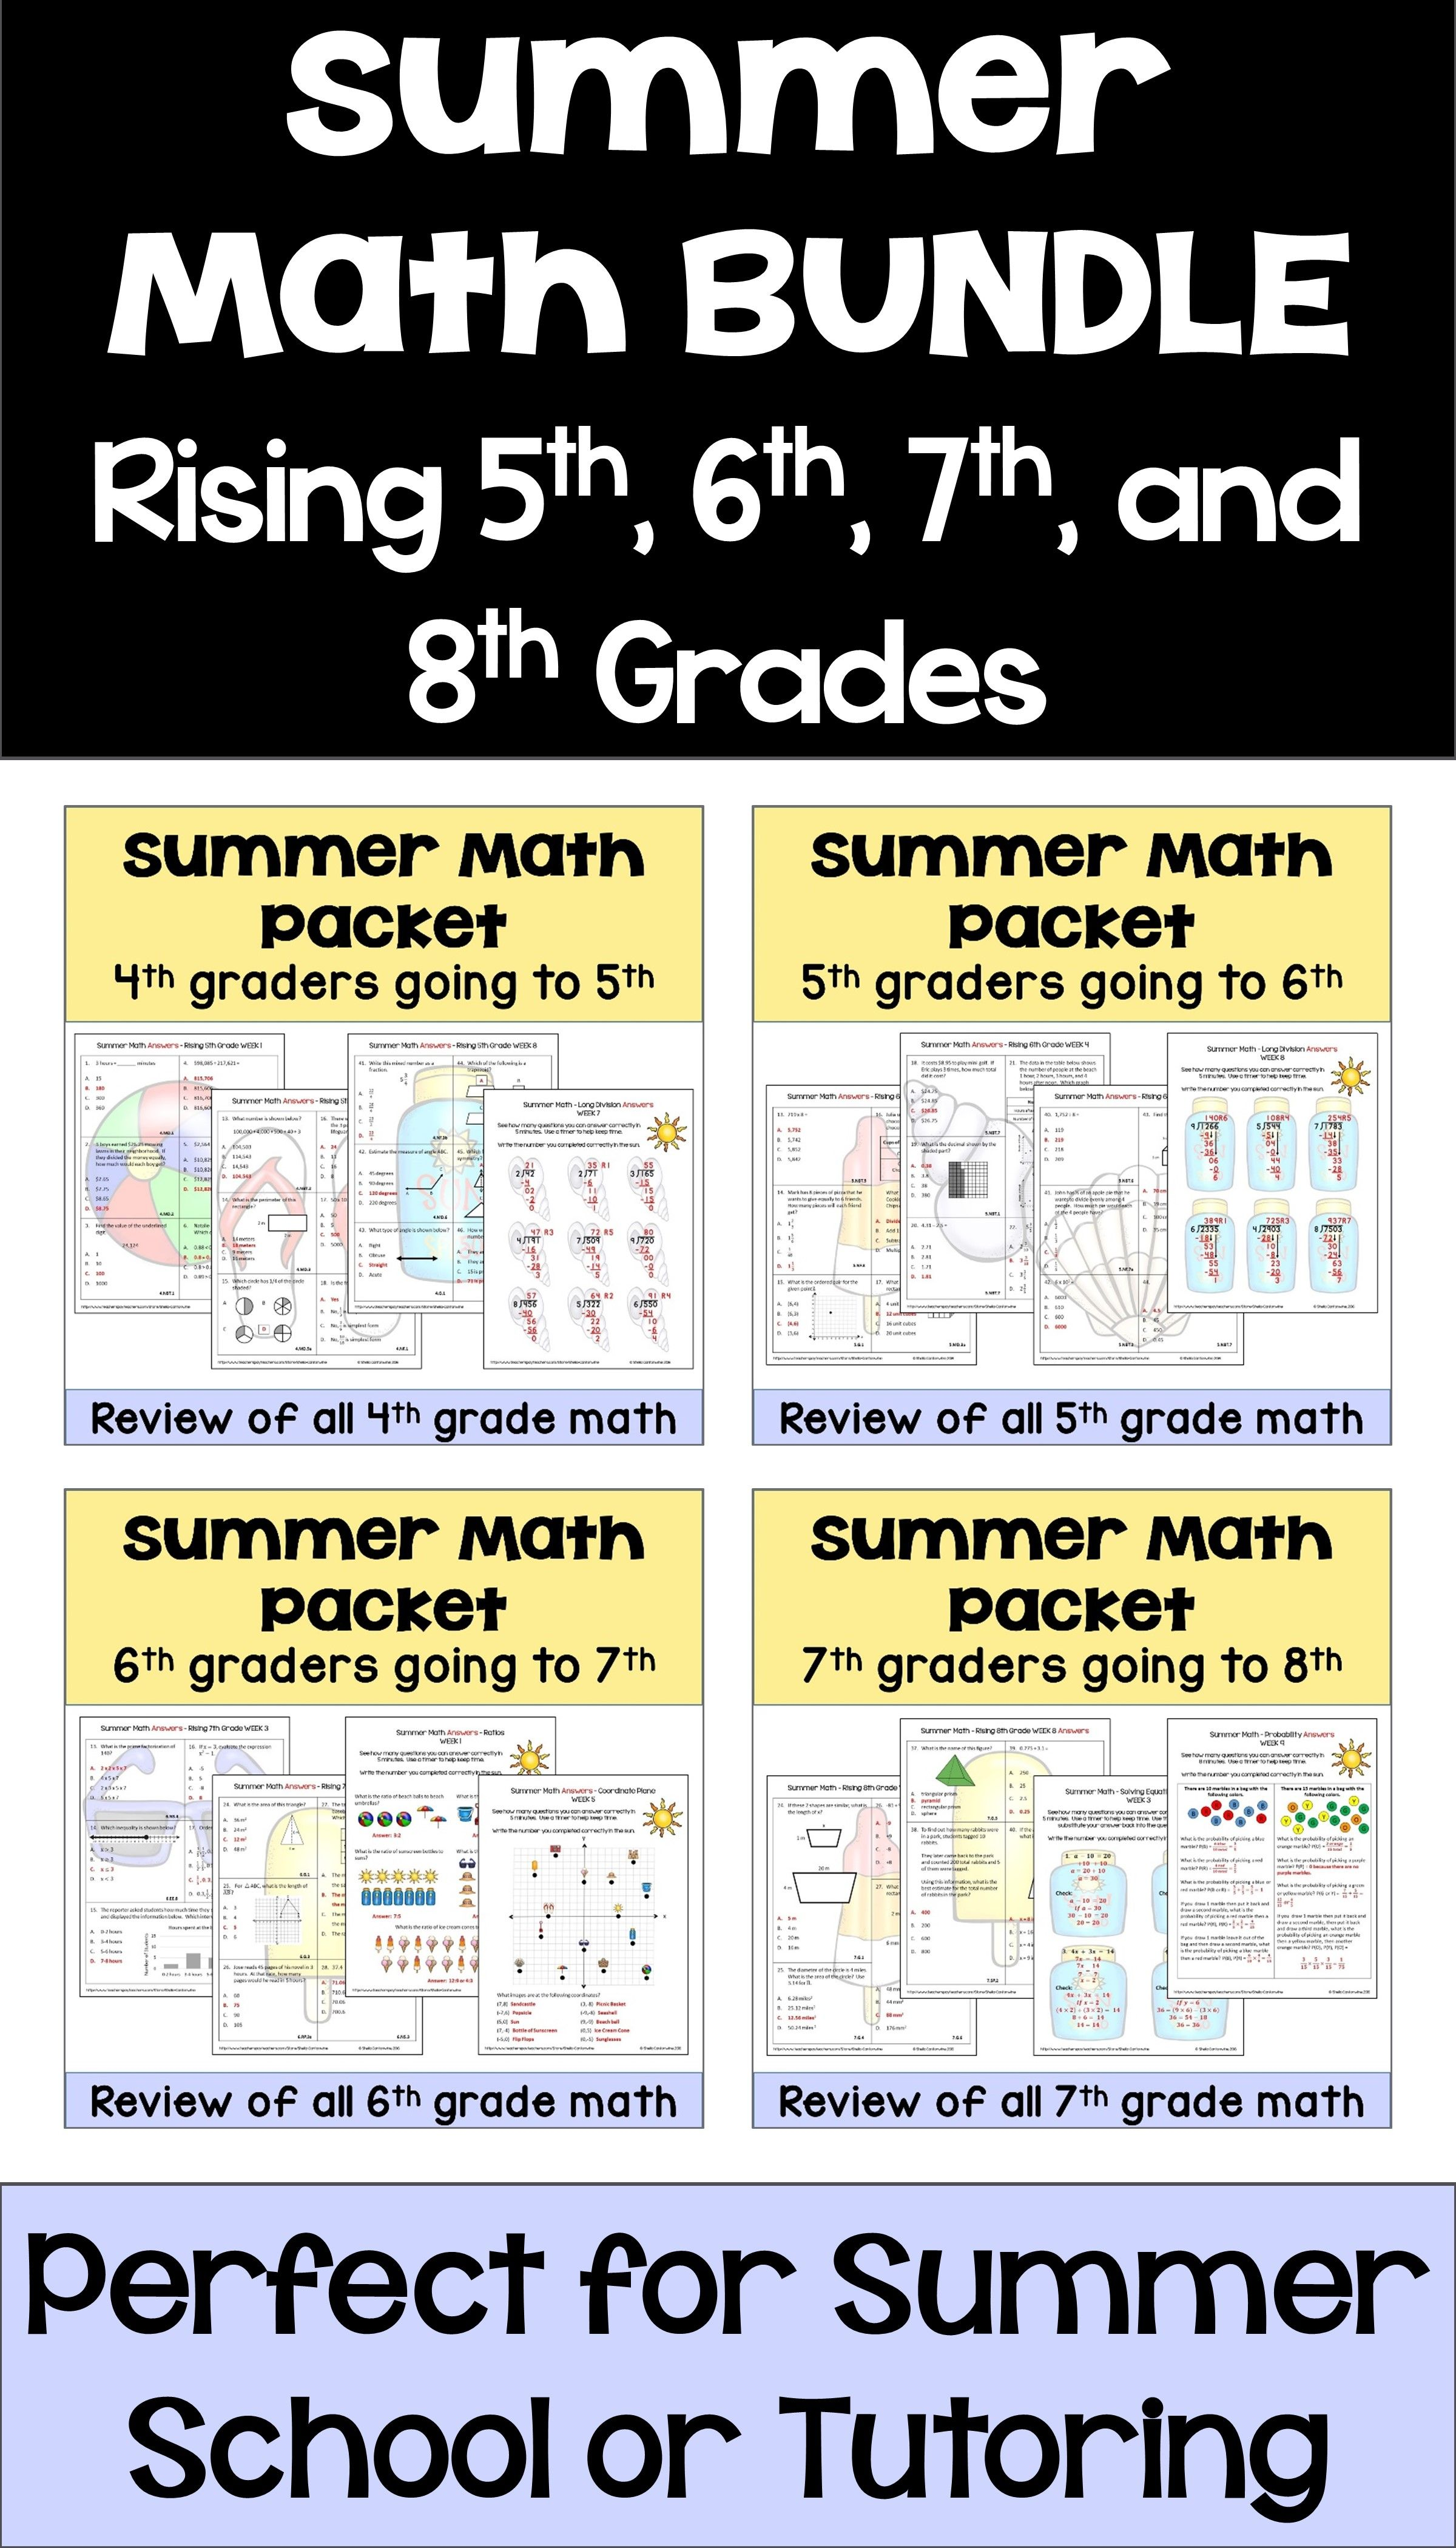 Summer Math Packet Bundle For Rising 4th 5th 6th 7th And 8th Grade Students Summer Math Math Packets Summer Math Packet